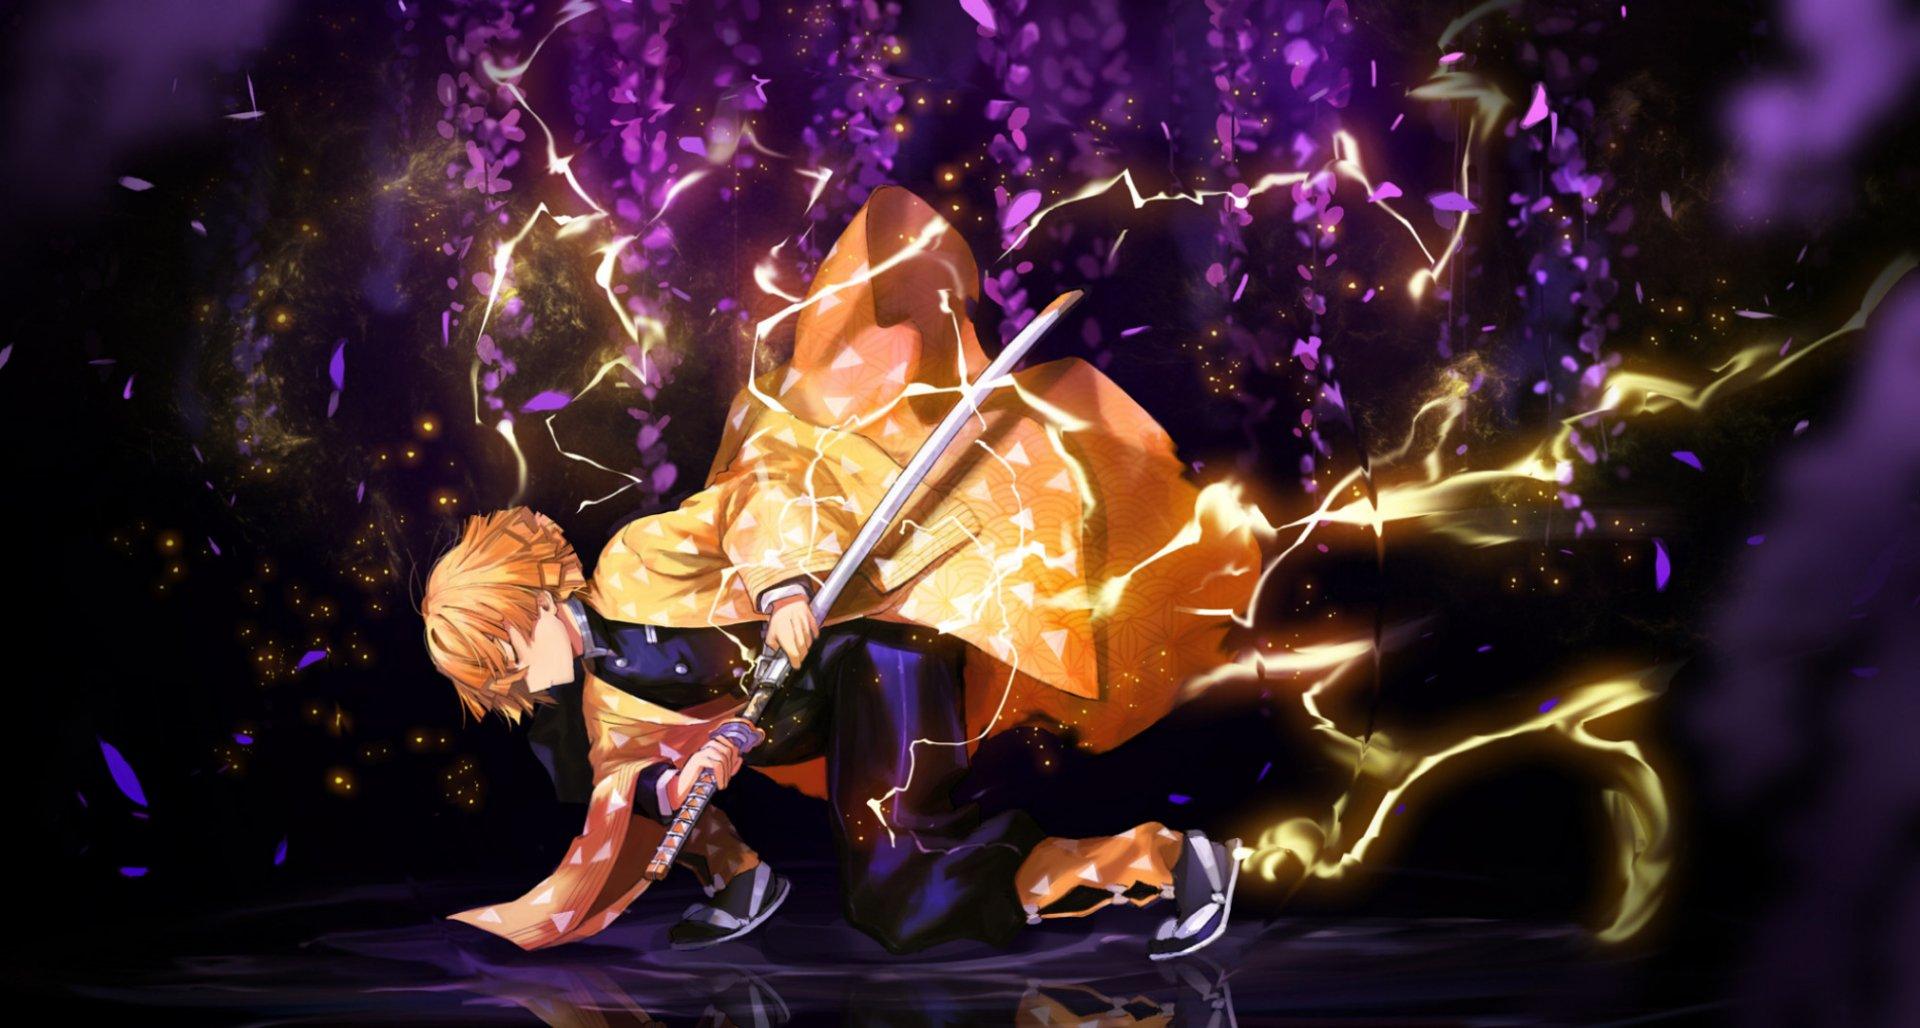 666 Demon Slayer Kimetsu no Yaiba HD Wallpapers Background 1920x1028